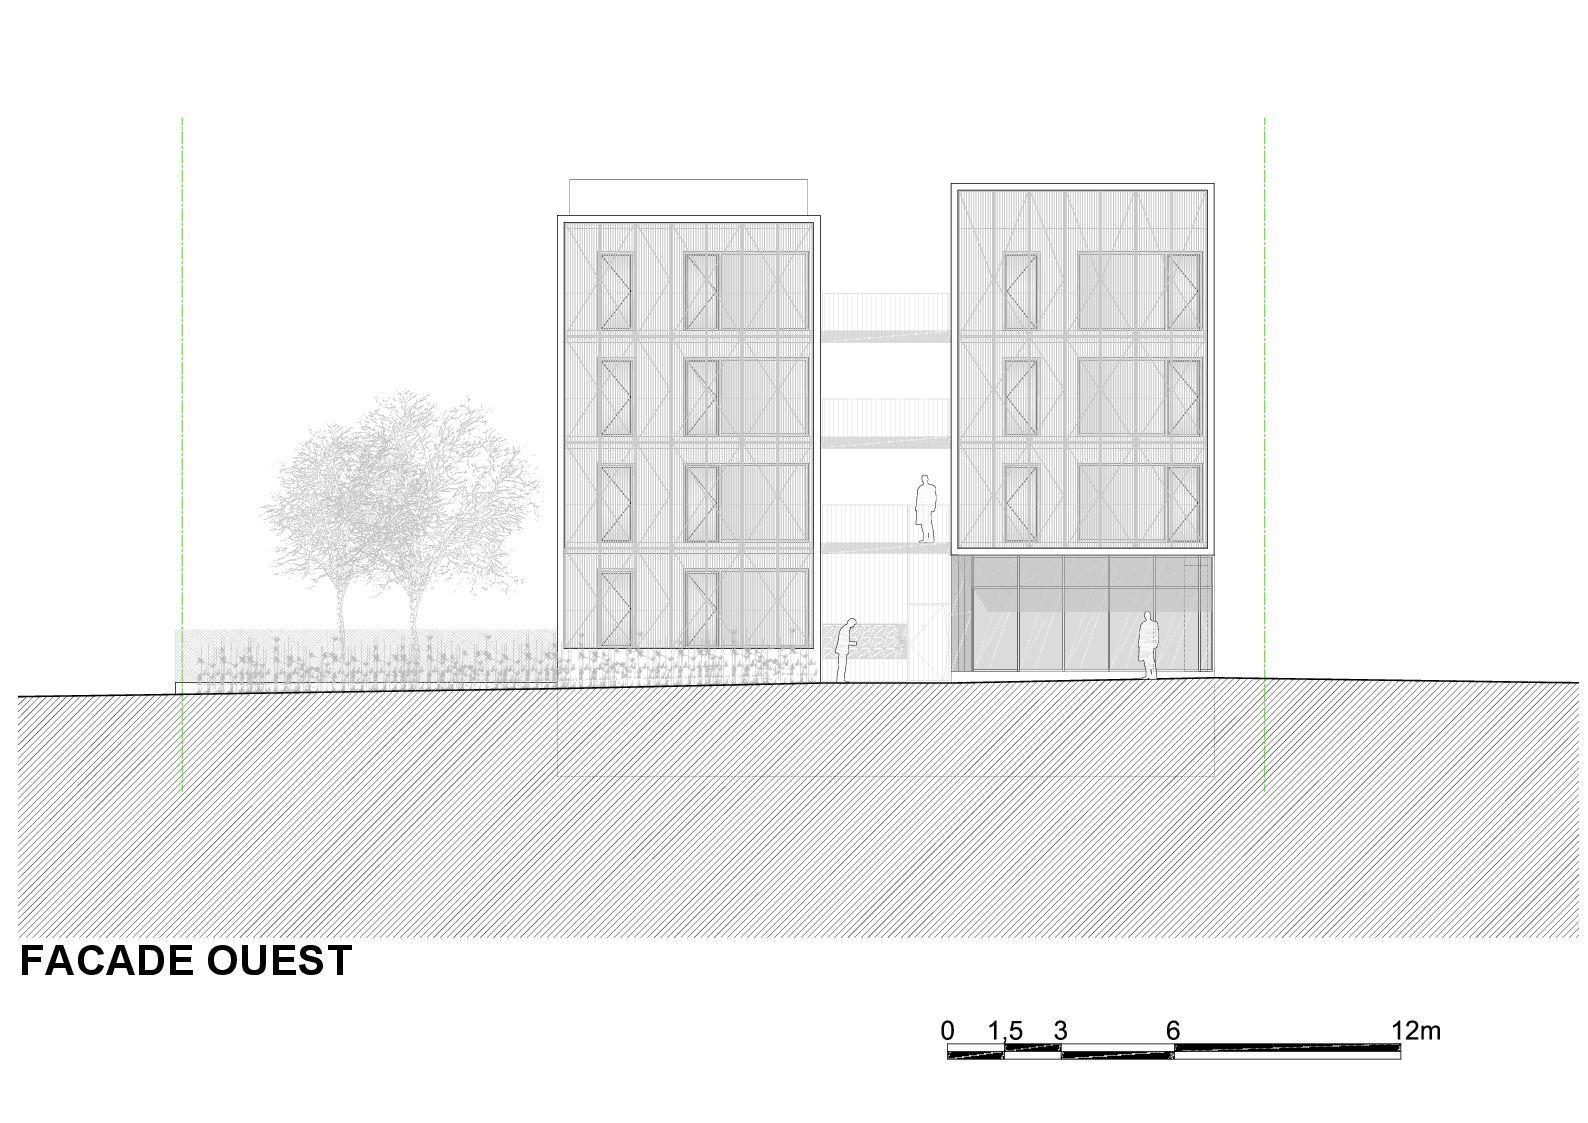 galer a de vivienda social tiendas en mouans sartoux comte et vollenweider architectes 44. Black Bedroom Furniture Sets. Home Design Ideas